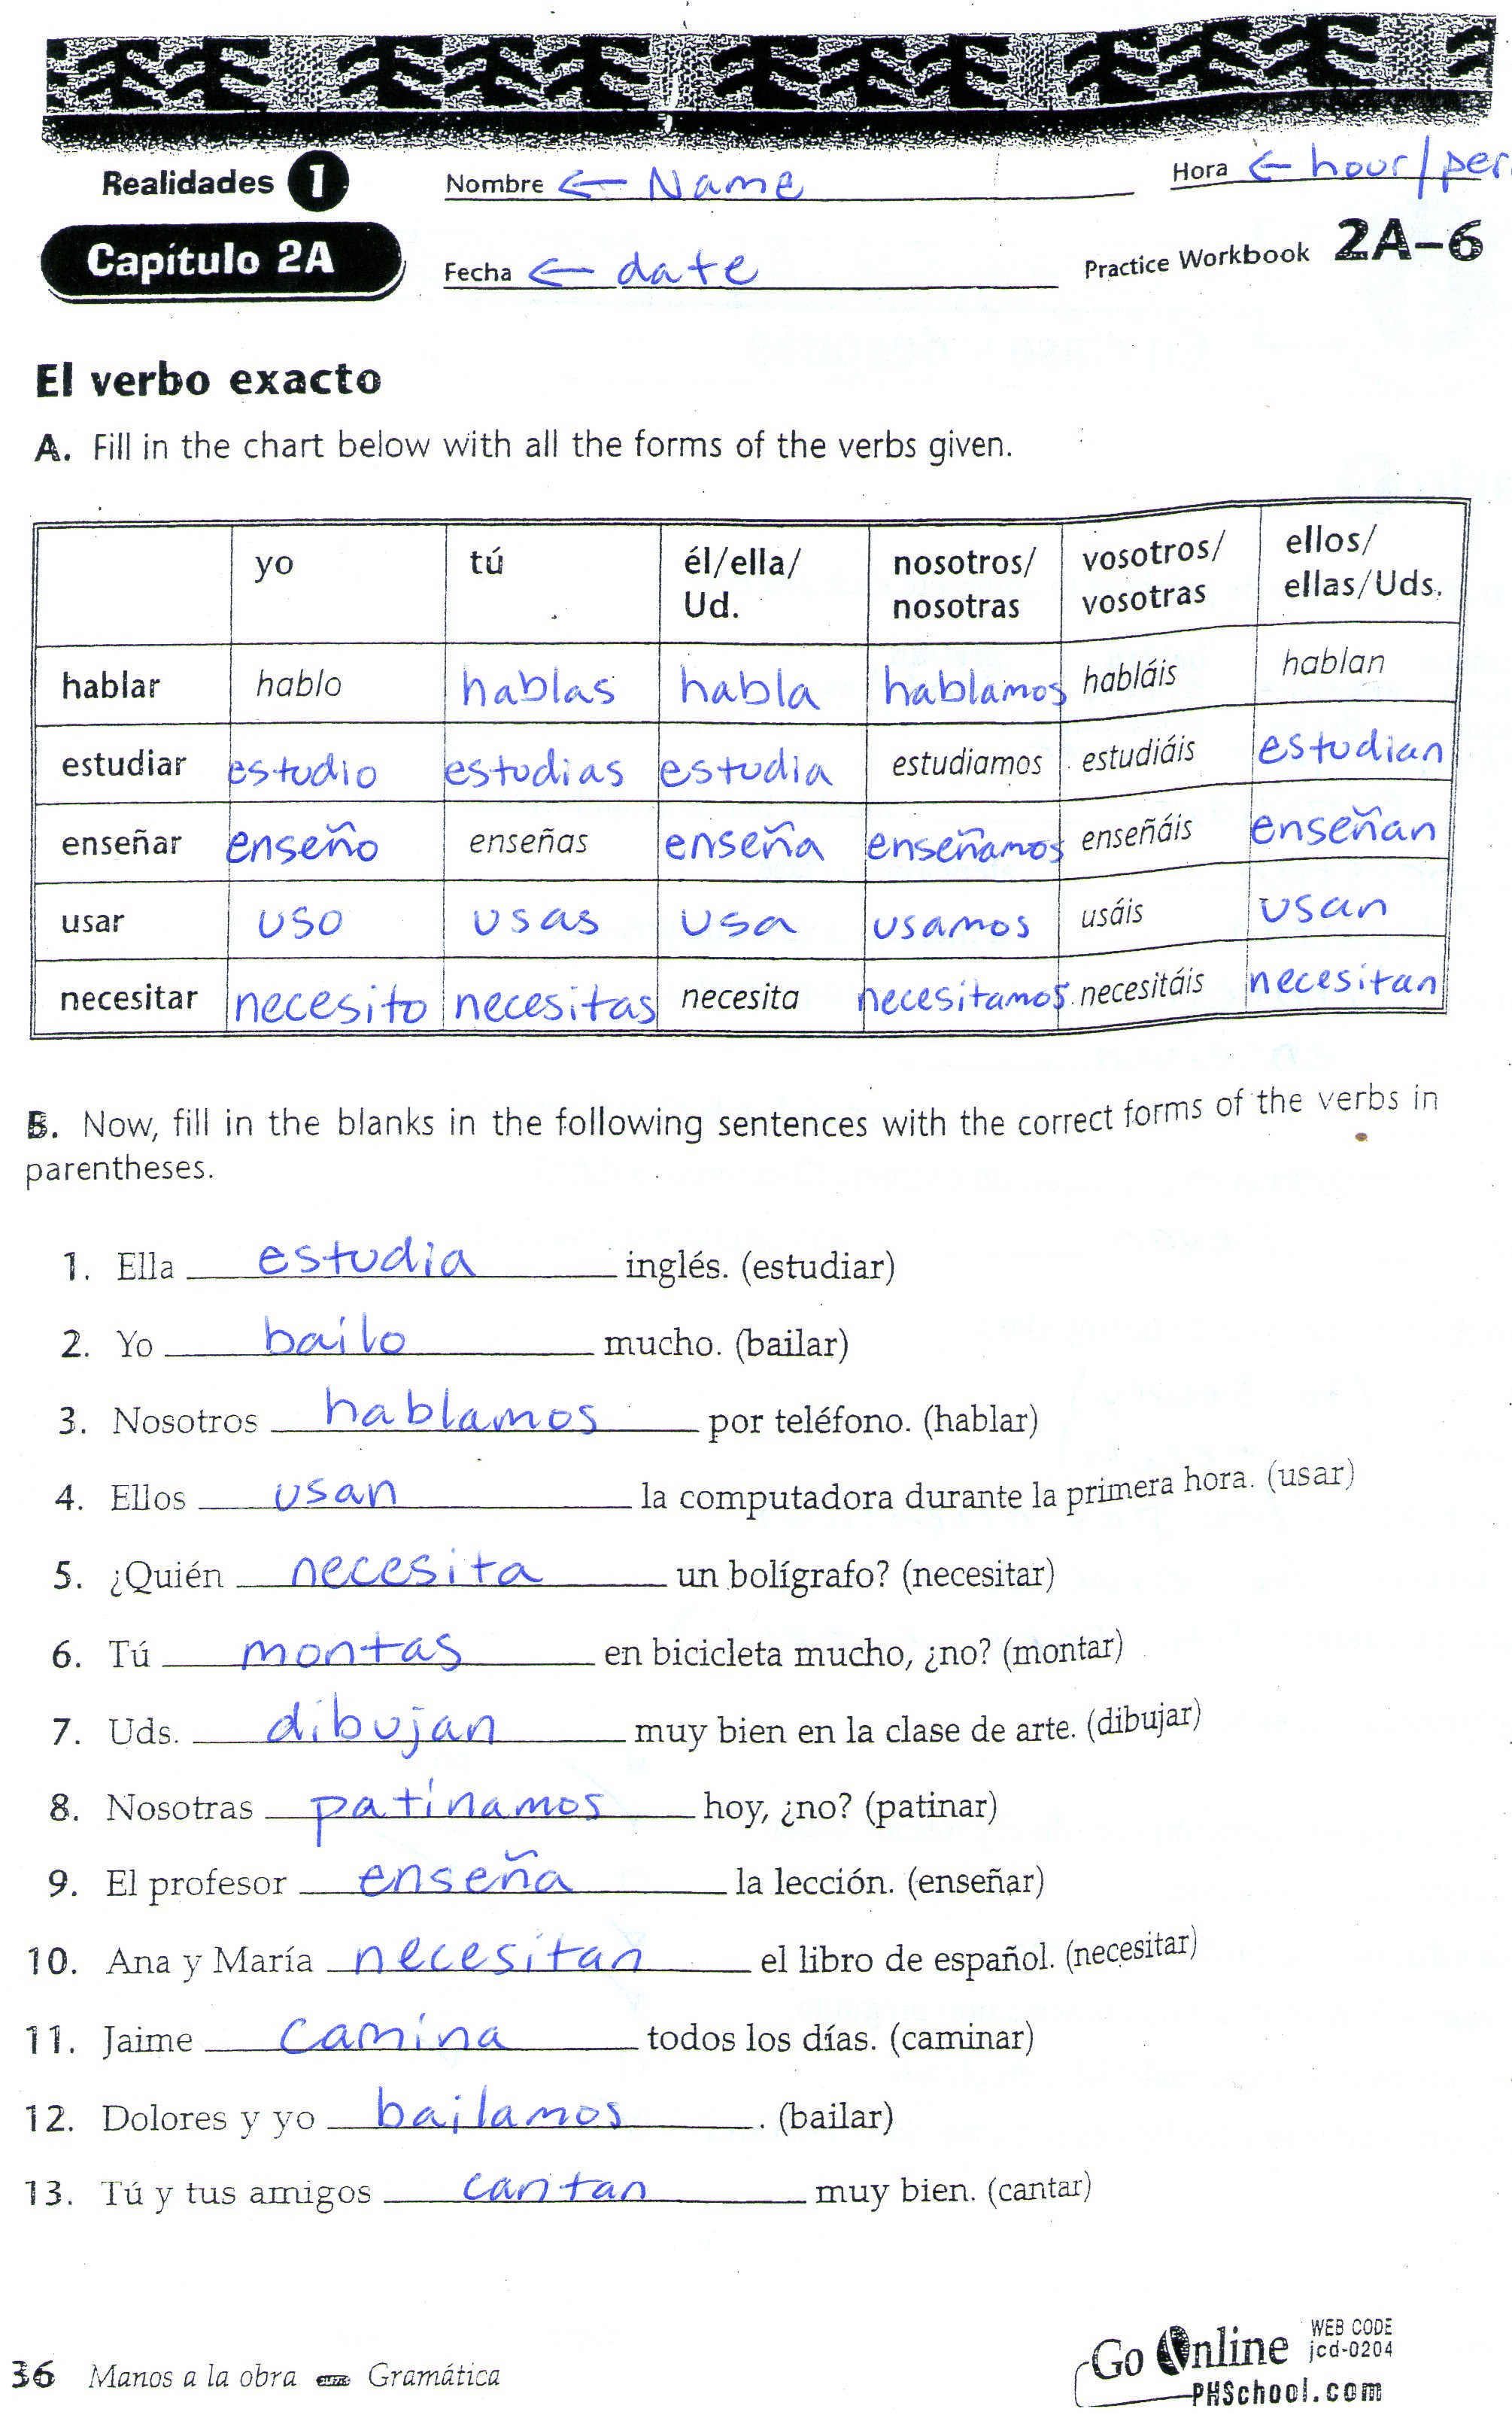 Spanish Reflexive Verbs Worksheet Printable Worksheet 415 Reflexive Verbs Answer Key